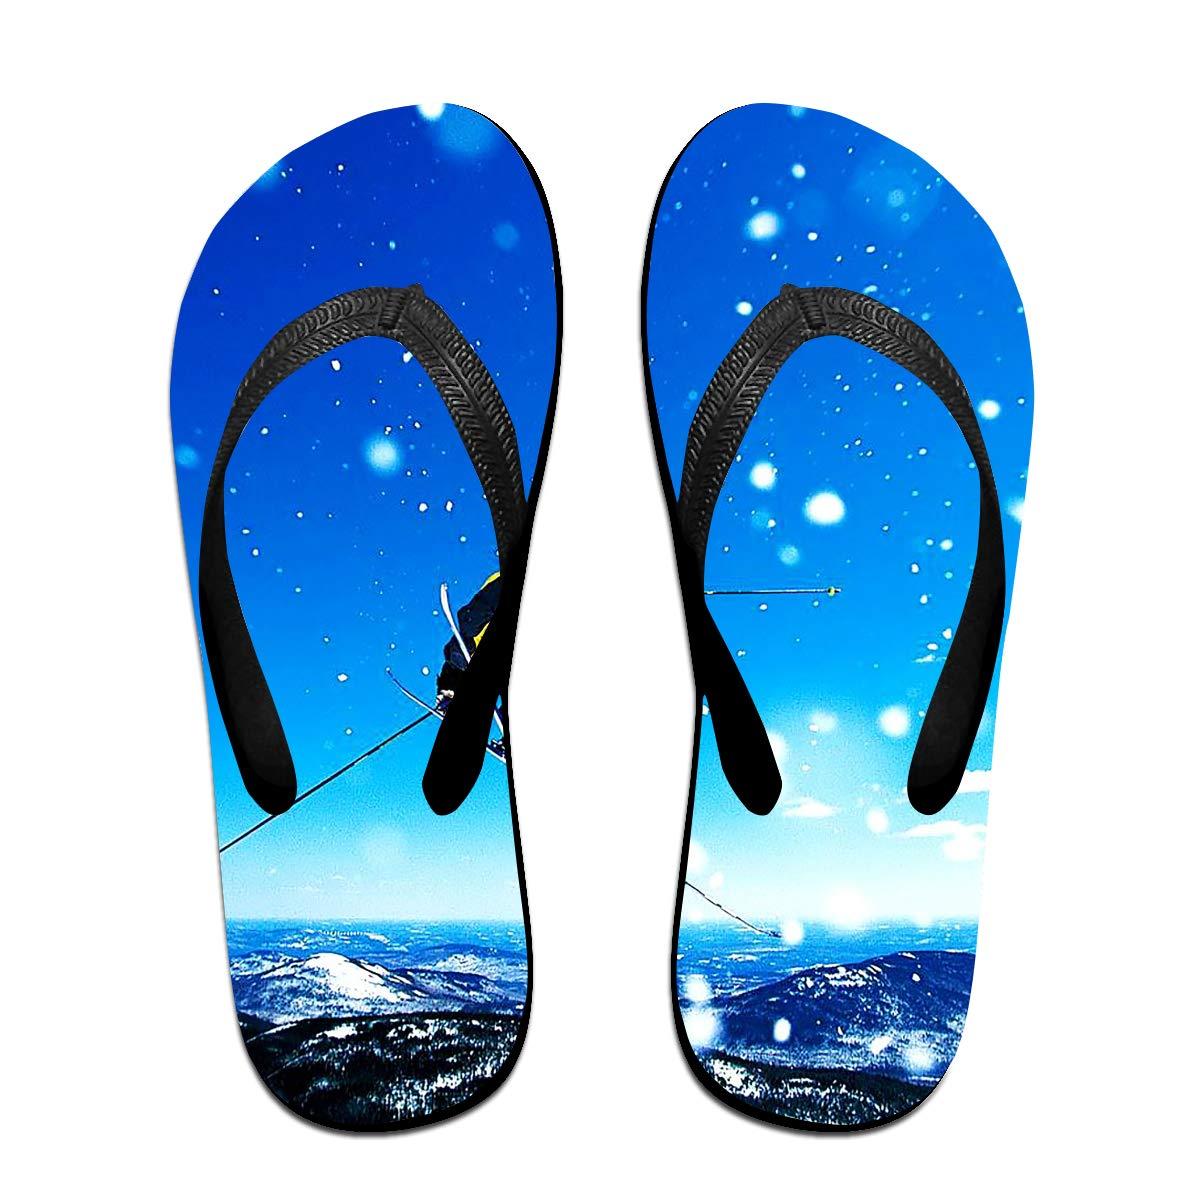 Couple Slipper Skiing Man Print Flip Flops Unisex Chic Sandals Rubber Non-Slip Spa Thong Slippers